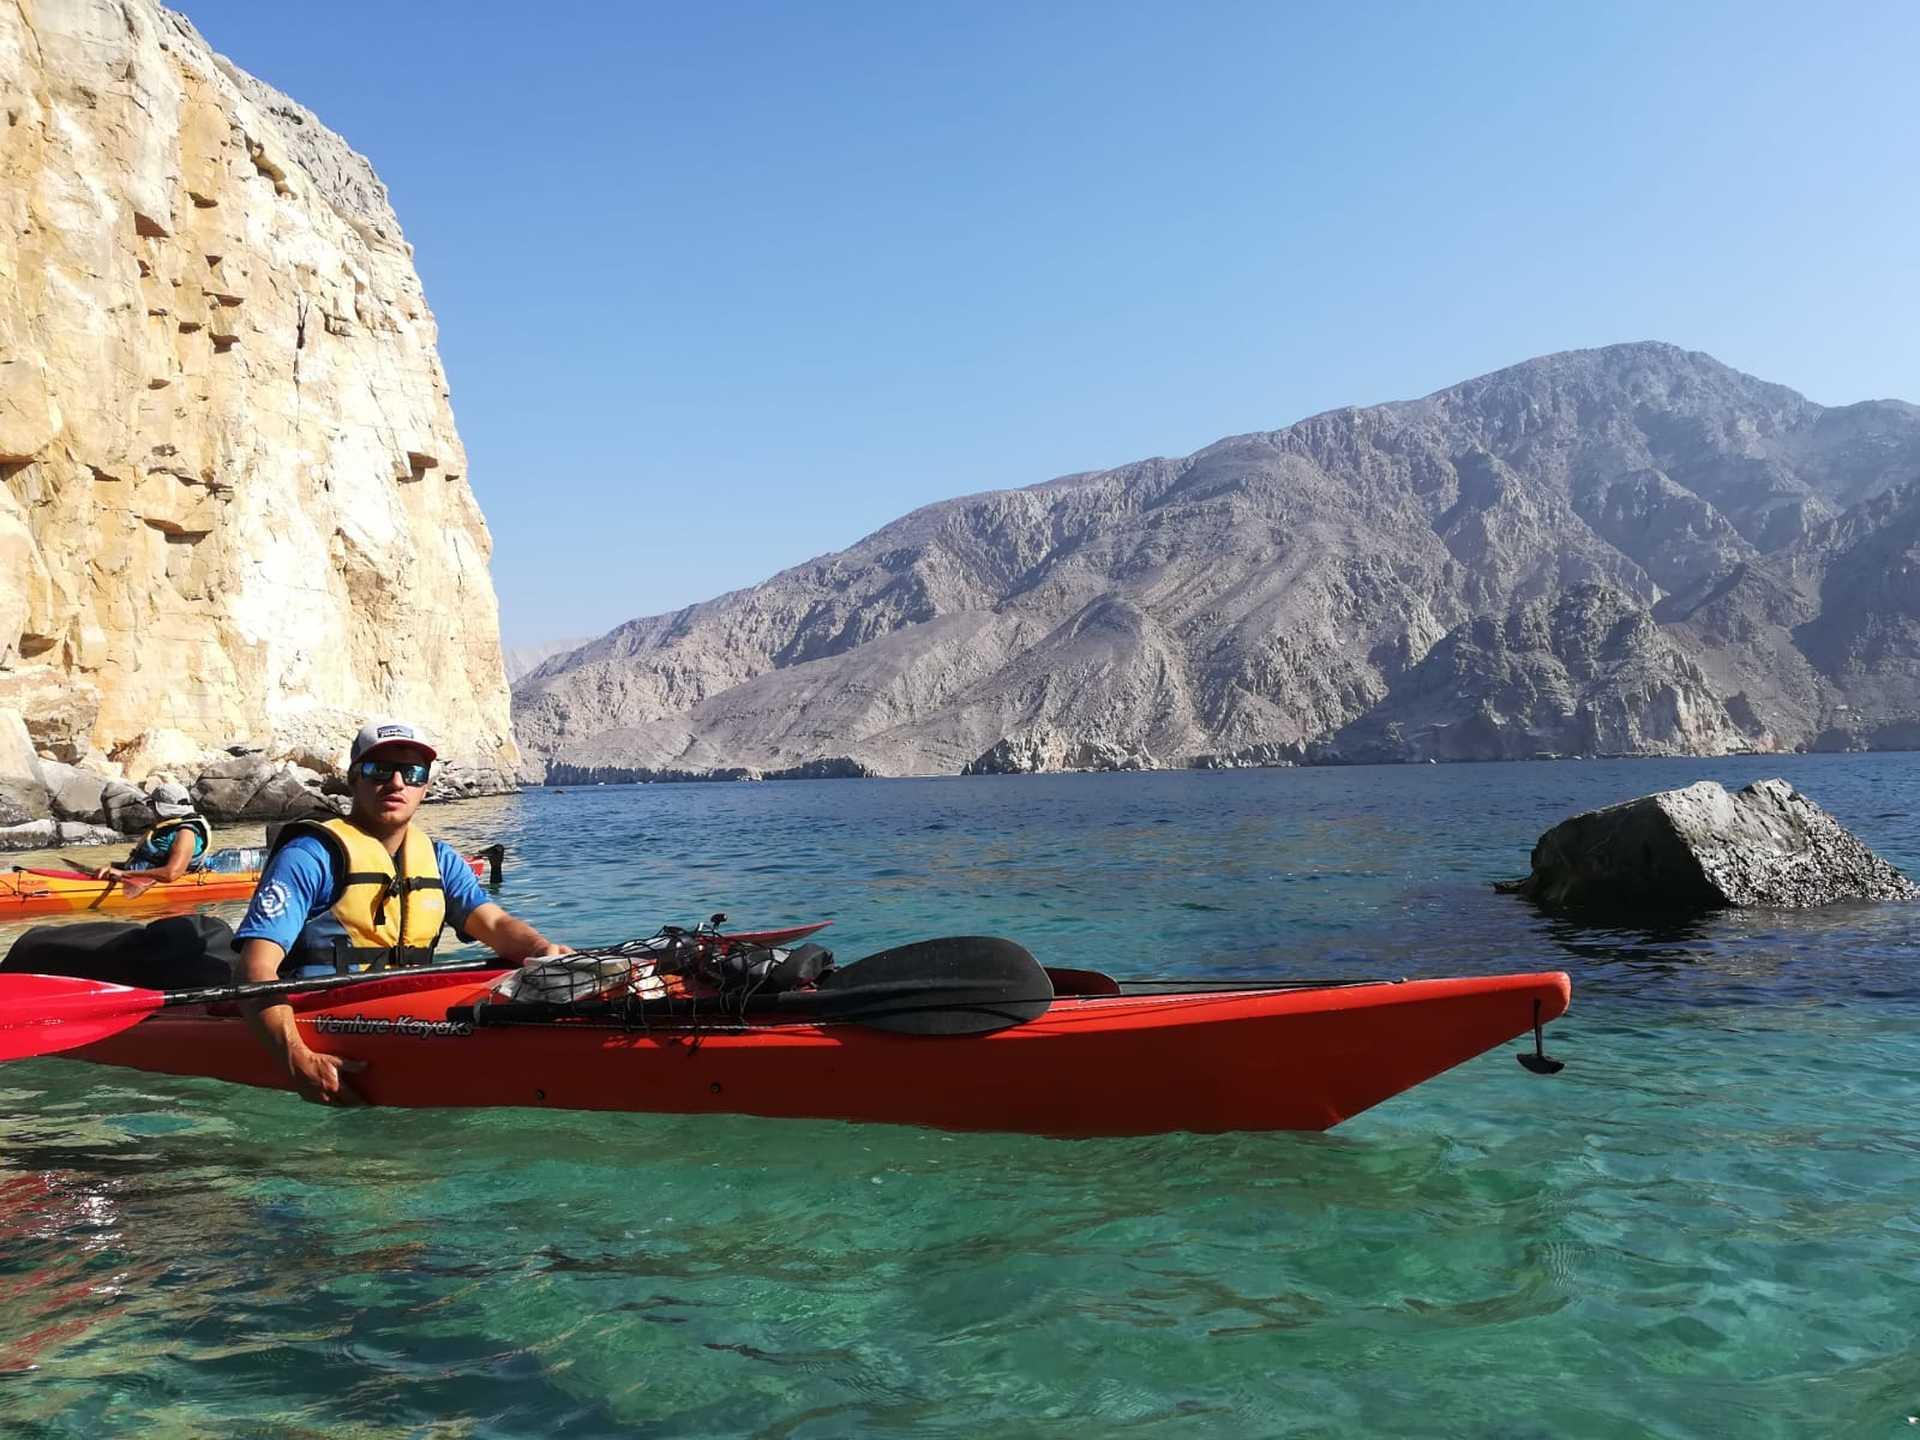 Guide Altaï en kayak à Oman